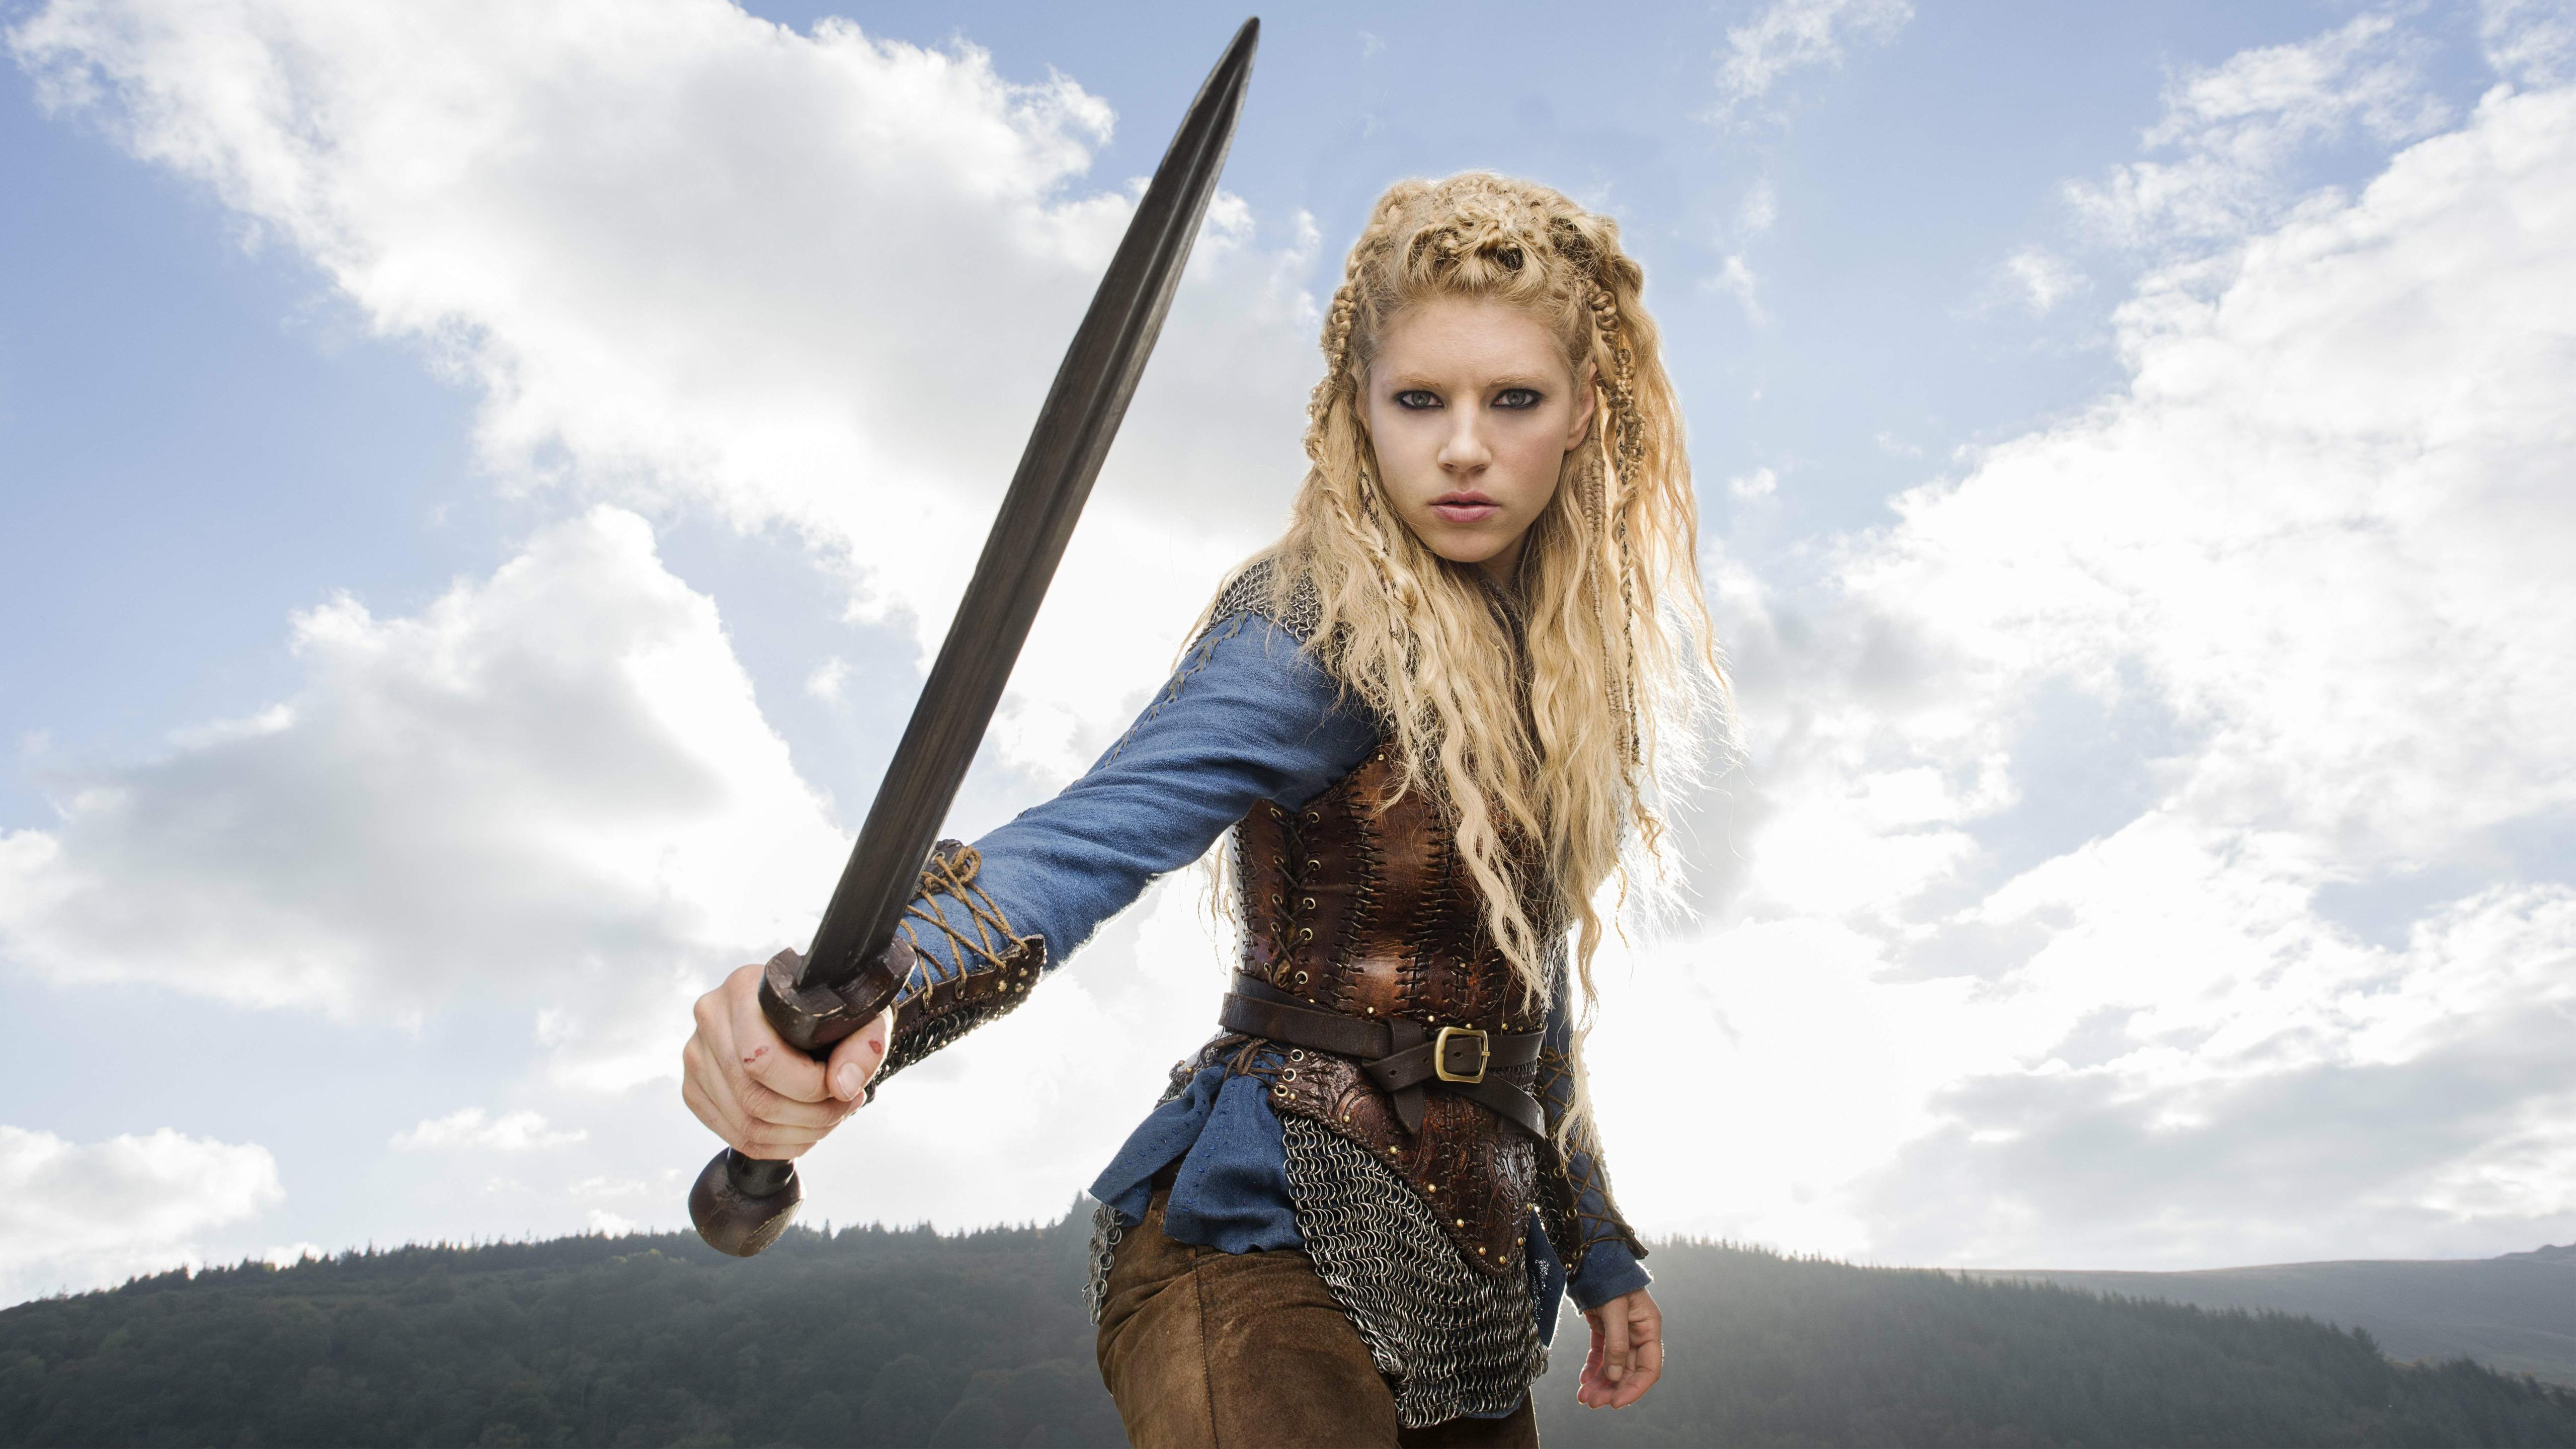 People 5120x2880 Katheryn Winnick Vikings Lagertha Lothbrok Promos poster women actress warrior girls